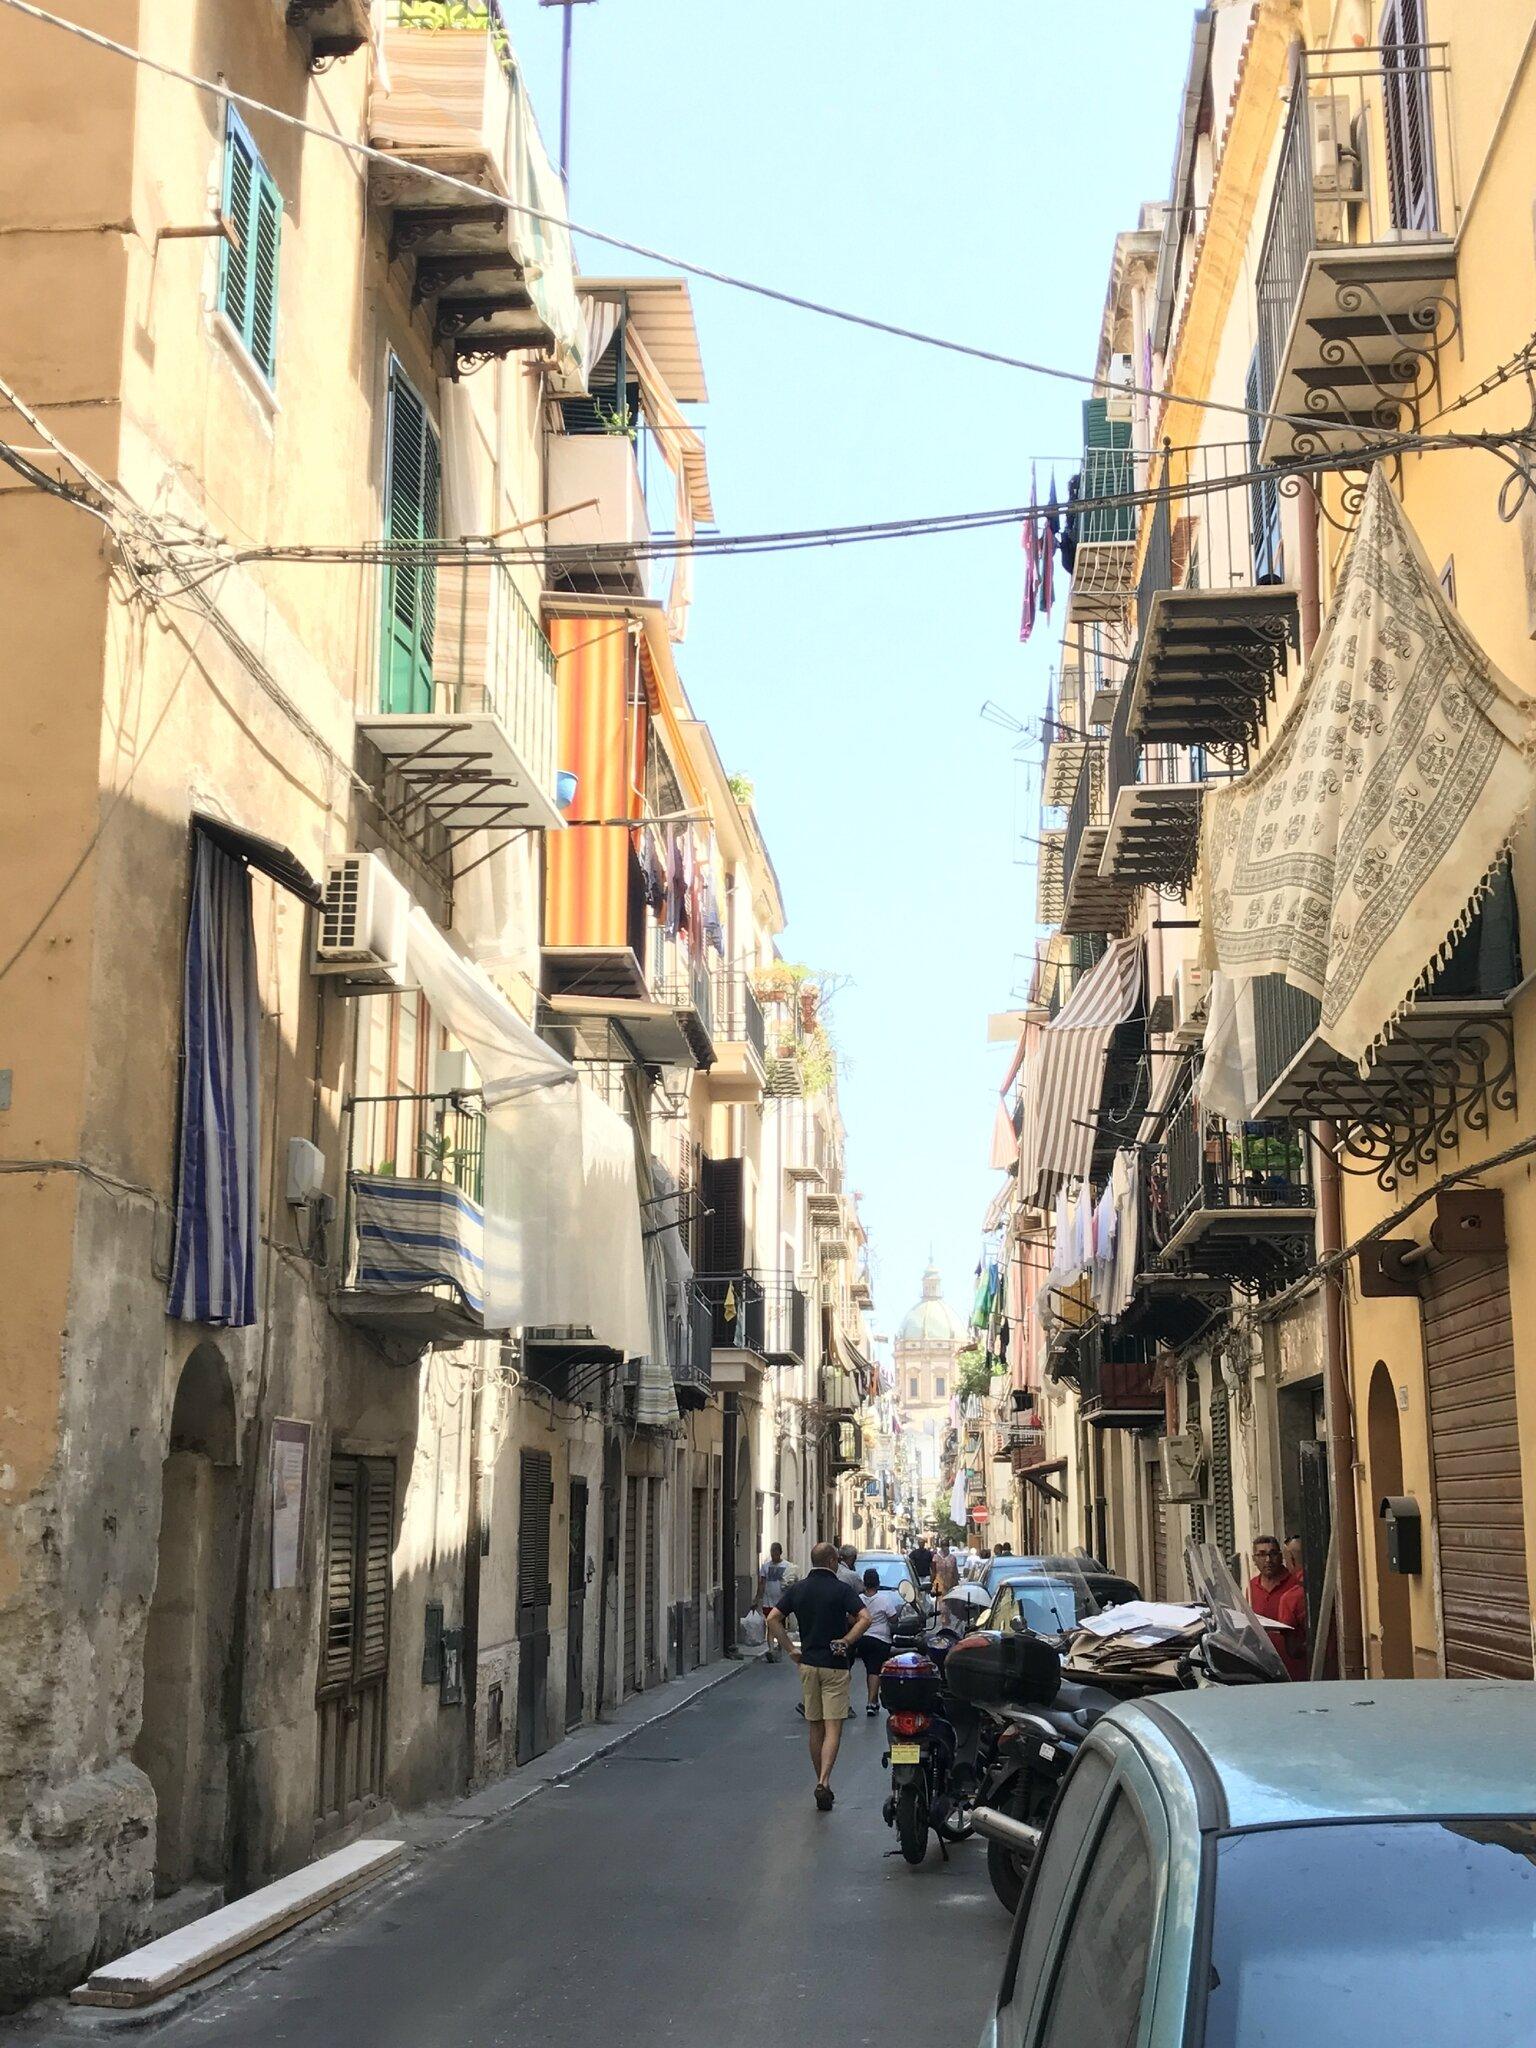 Road trip #1 - Palermo & Monreale